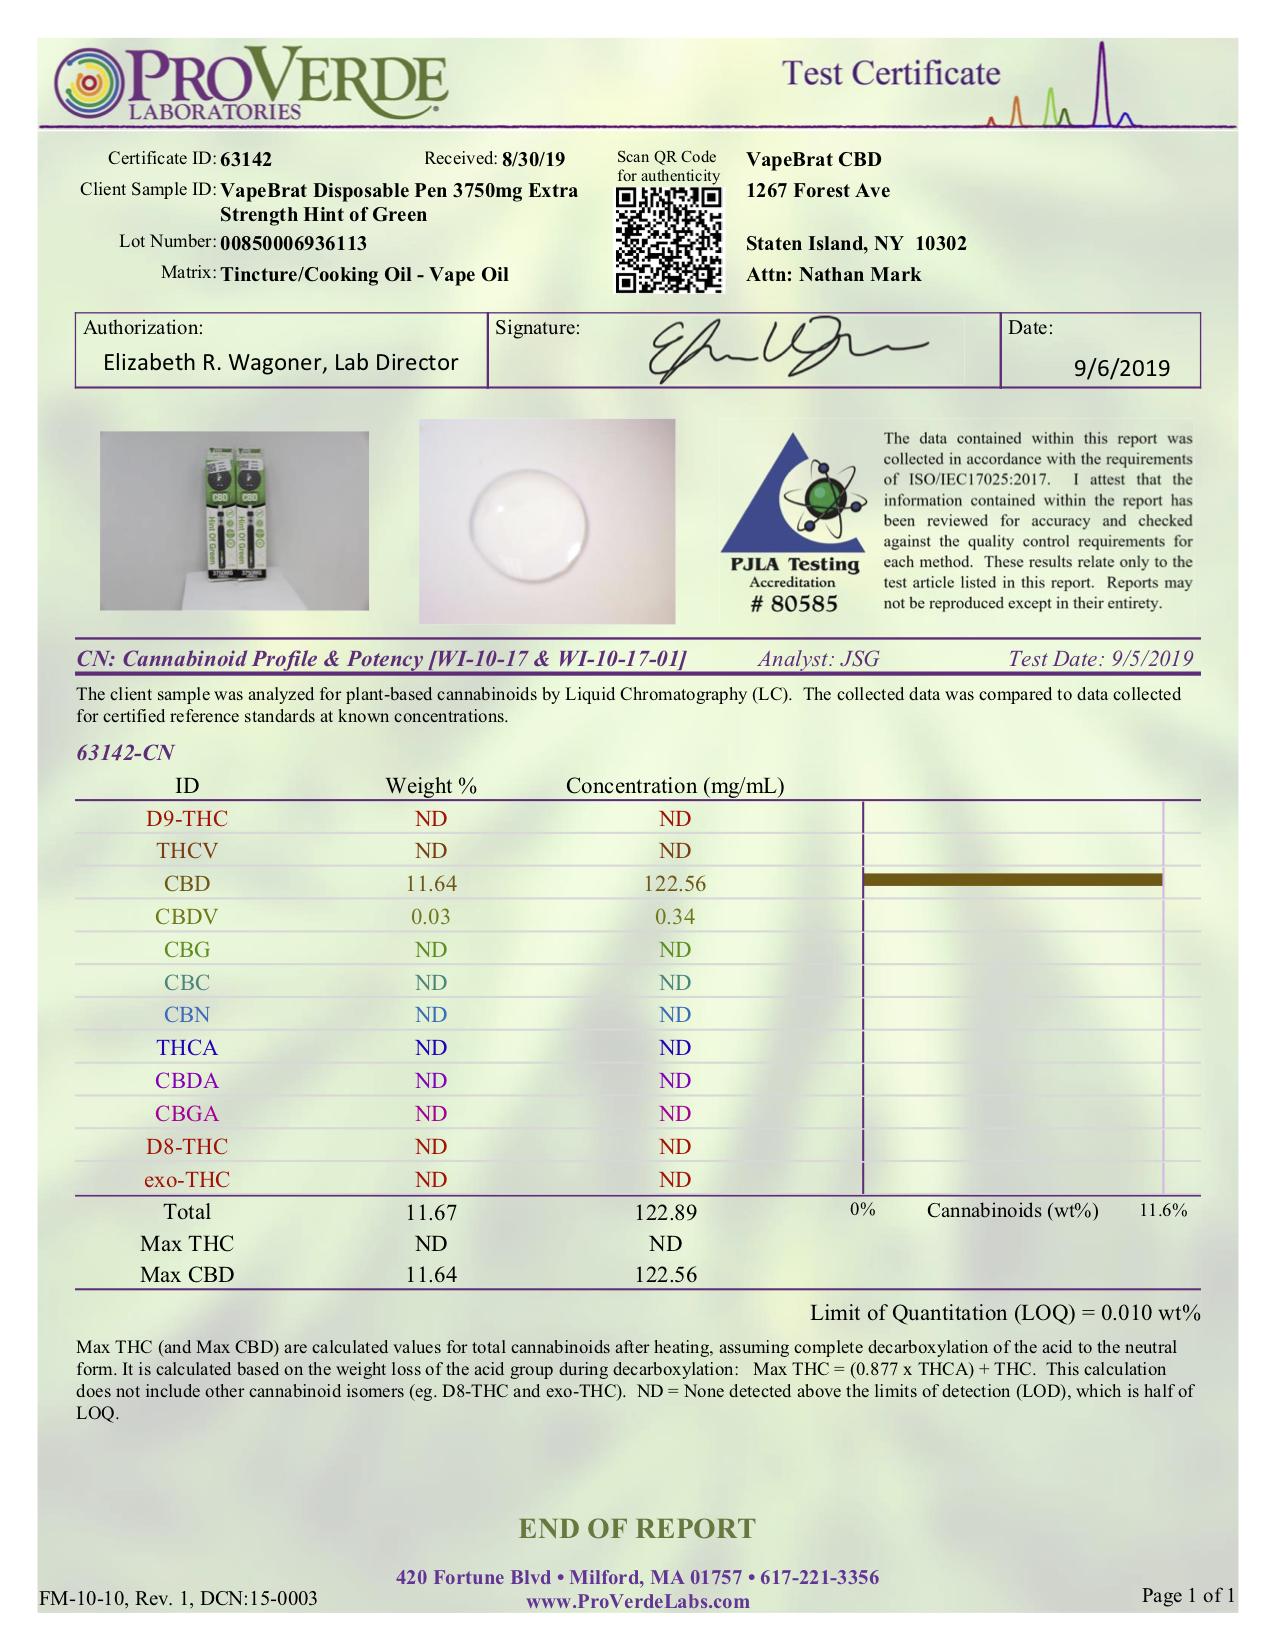 63142-vapebrat-disposable-pen-3750mg-extra-strength-hint-of-green.jpg